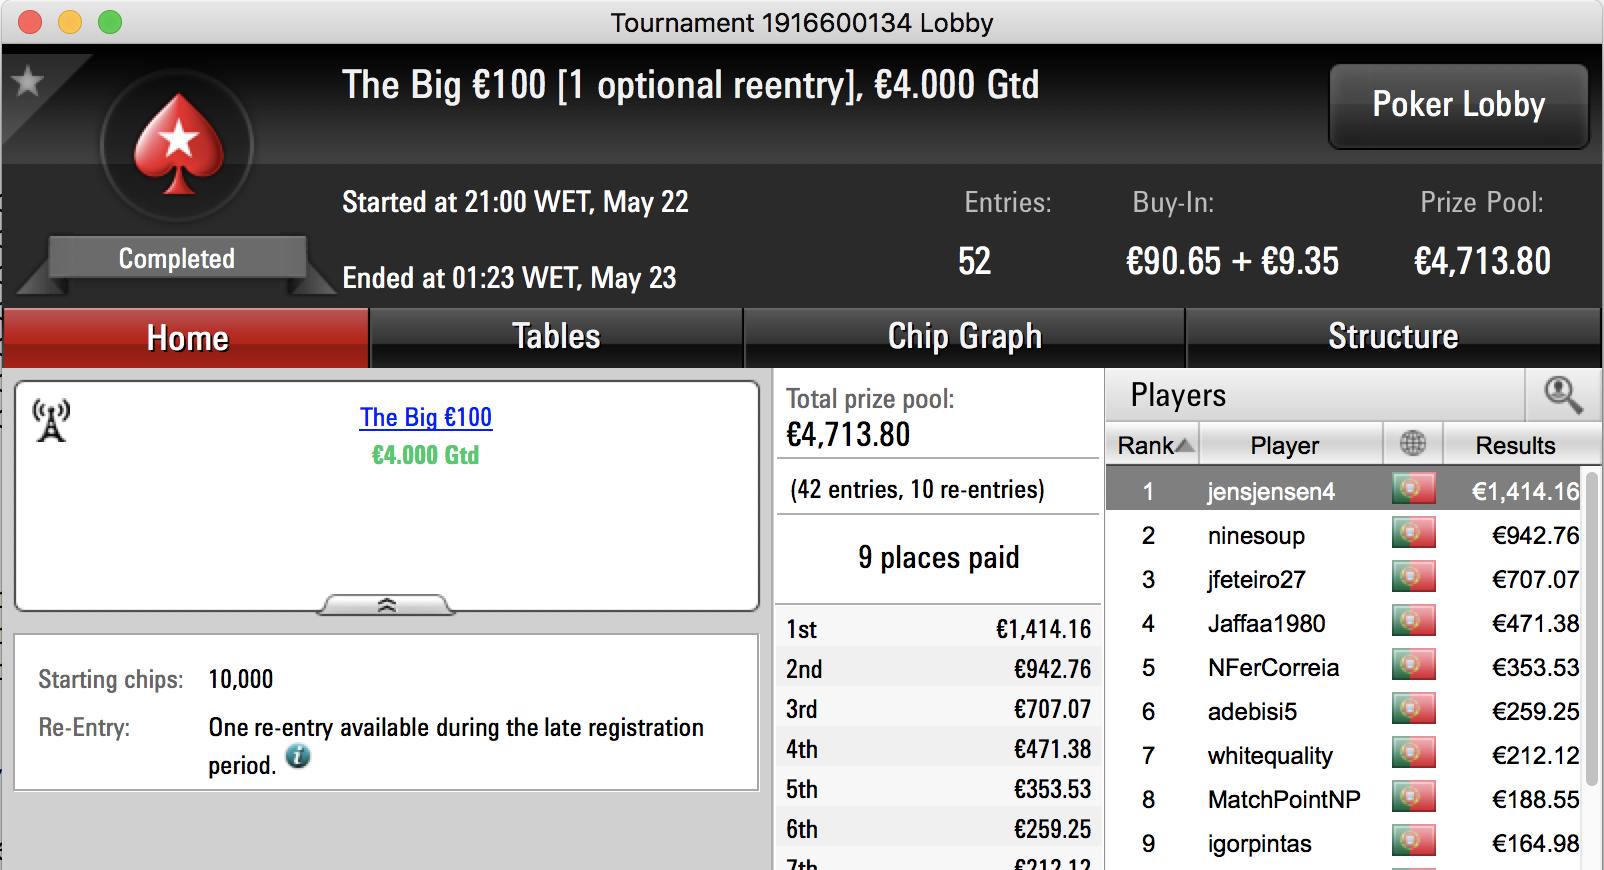 RSXLP43 e jensjensen4 Arrancam Bem a Semana na PokerStars.pt 103